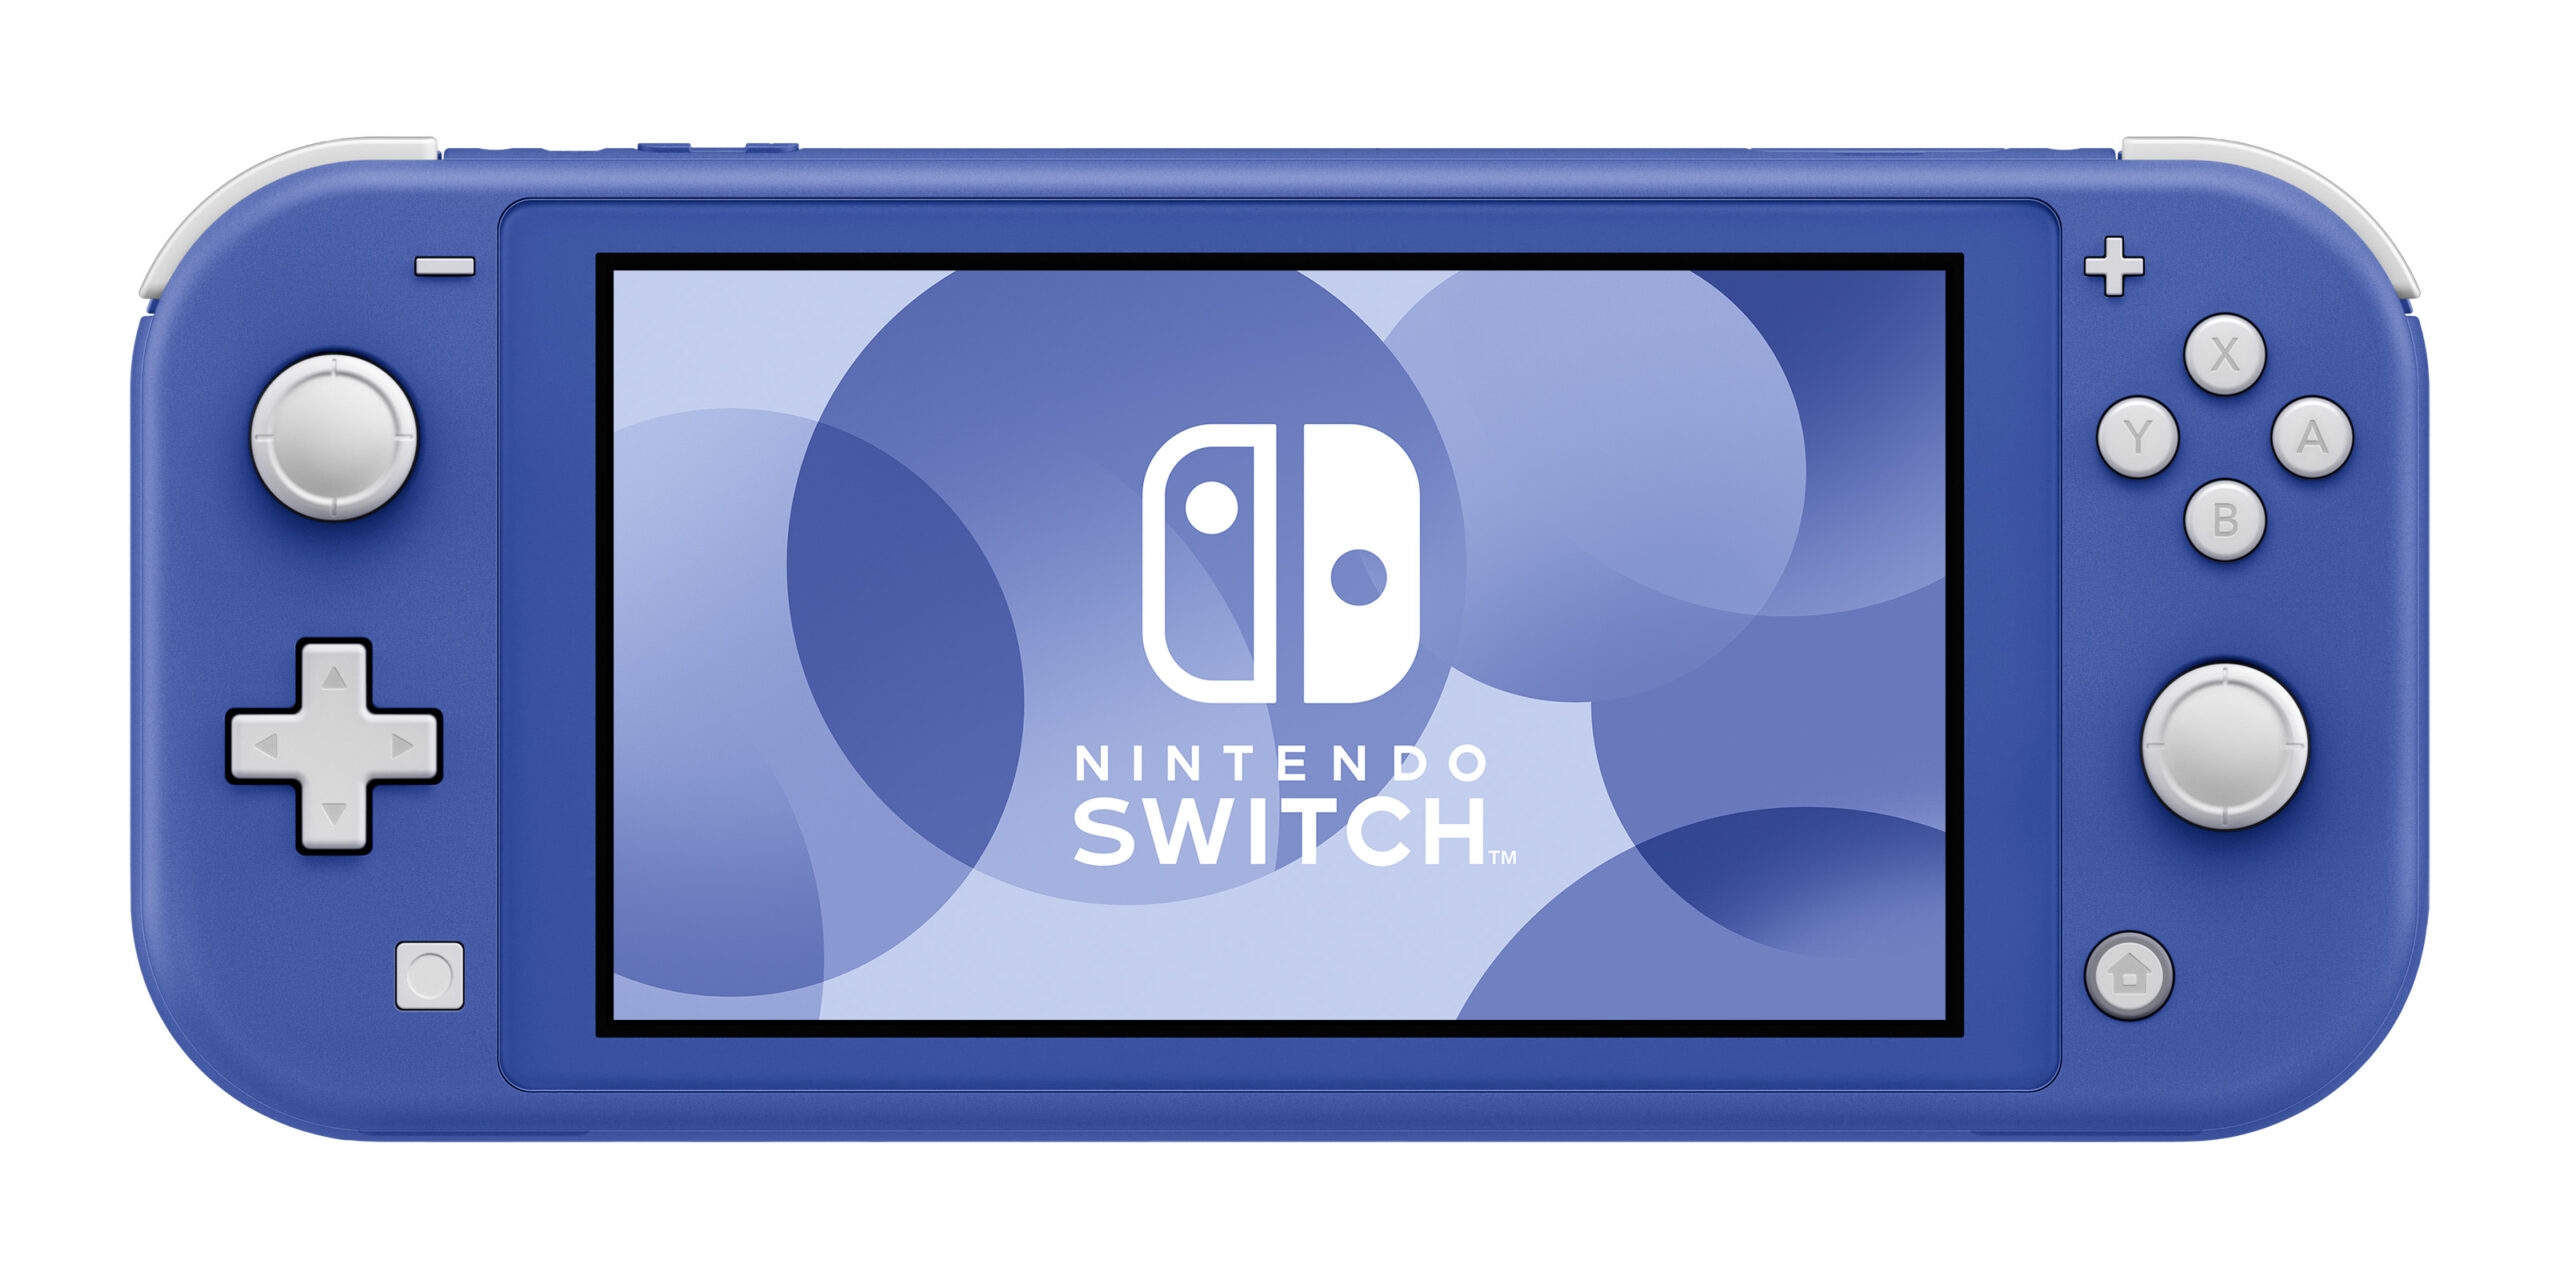 Nintendo Switch Lite – Ανακοινώθηκε μπλε χρώμα και έρχεται σύντομα!